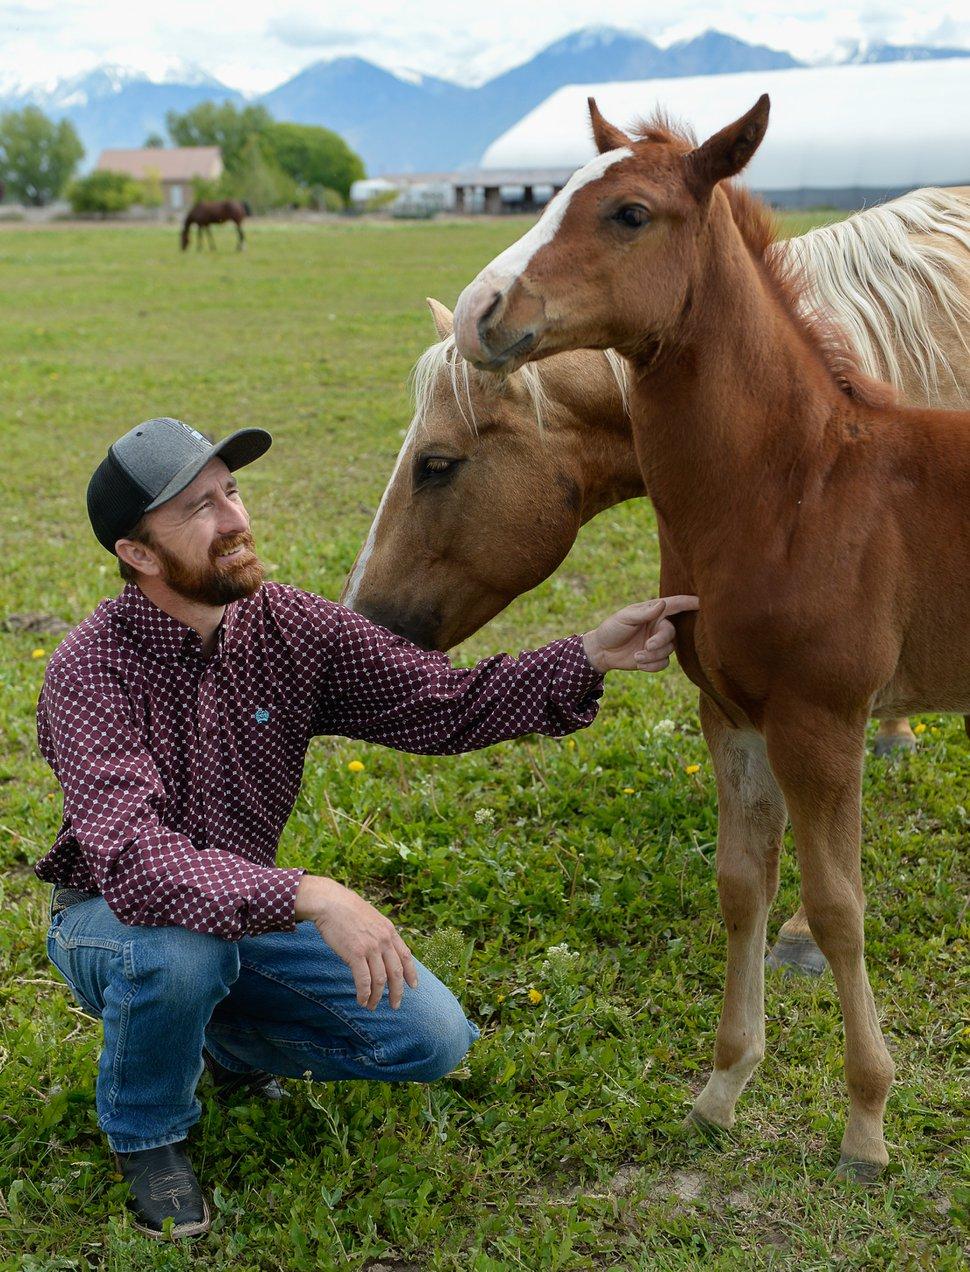 (Francisco Kjolseth | Tribune file photo) Utah County Commissioner Nathan Ivie on his 30-acre horse ranch in Benjamin in May 2019.